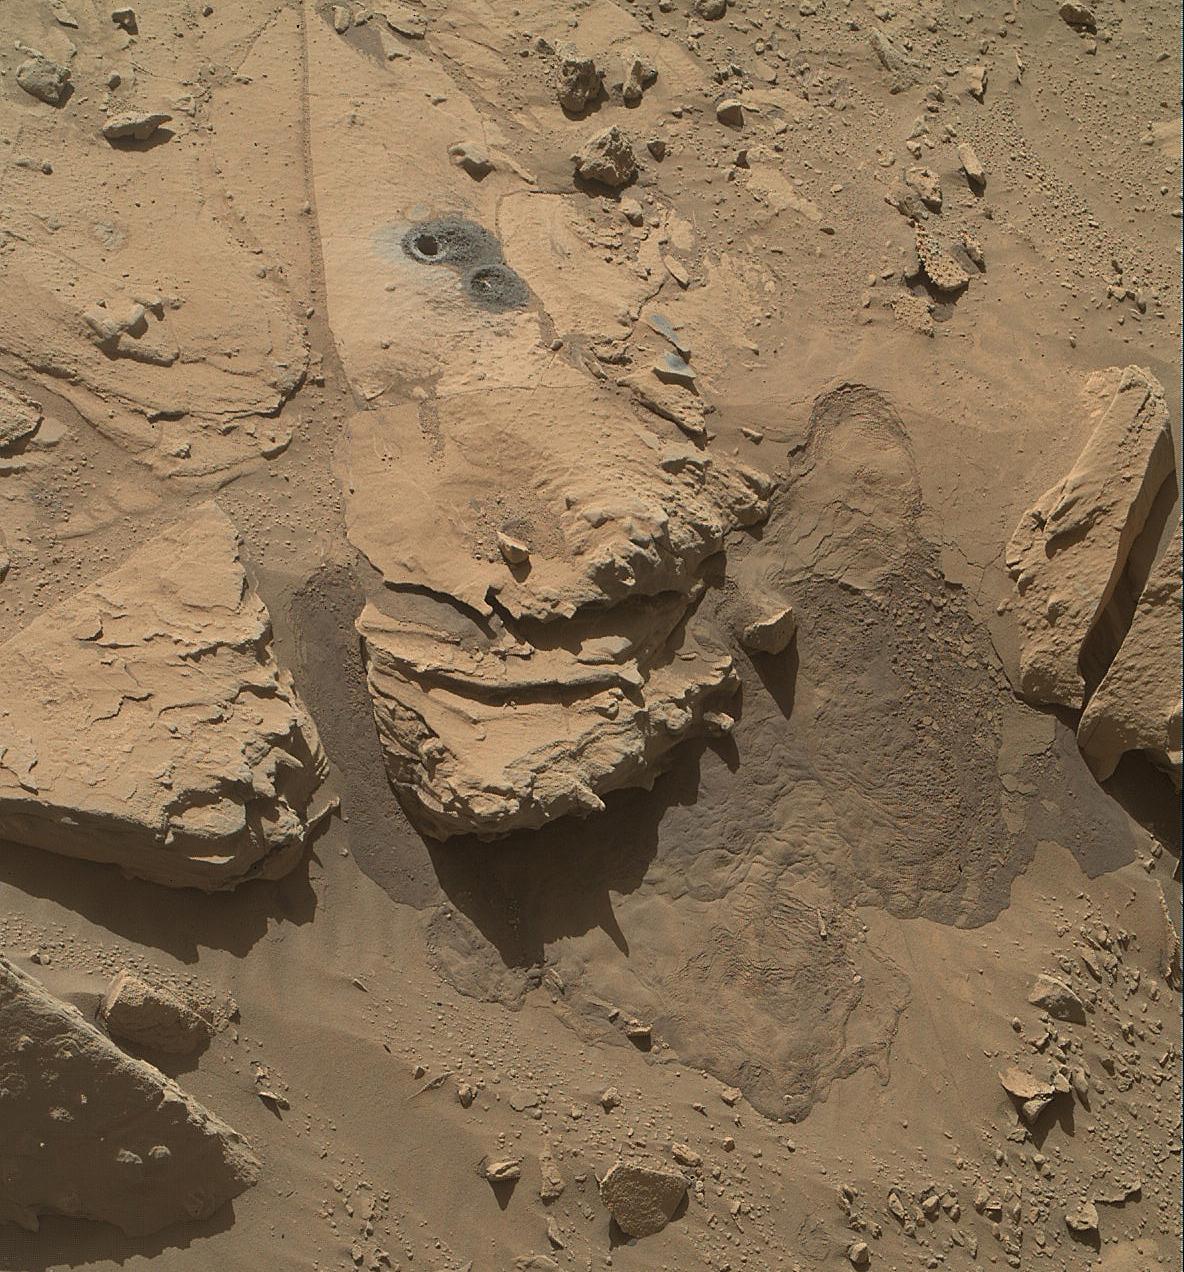 Curiosity marks sixth anniversary on Mars